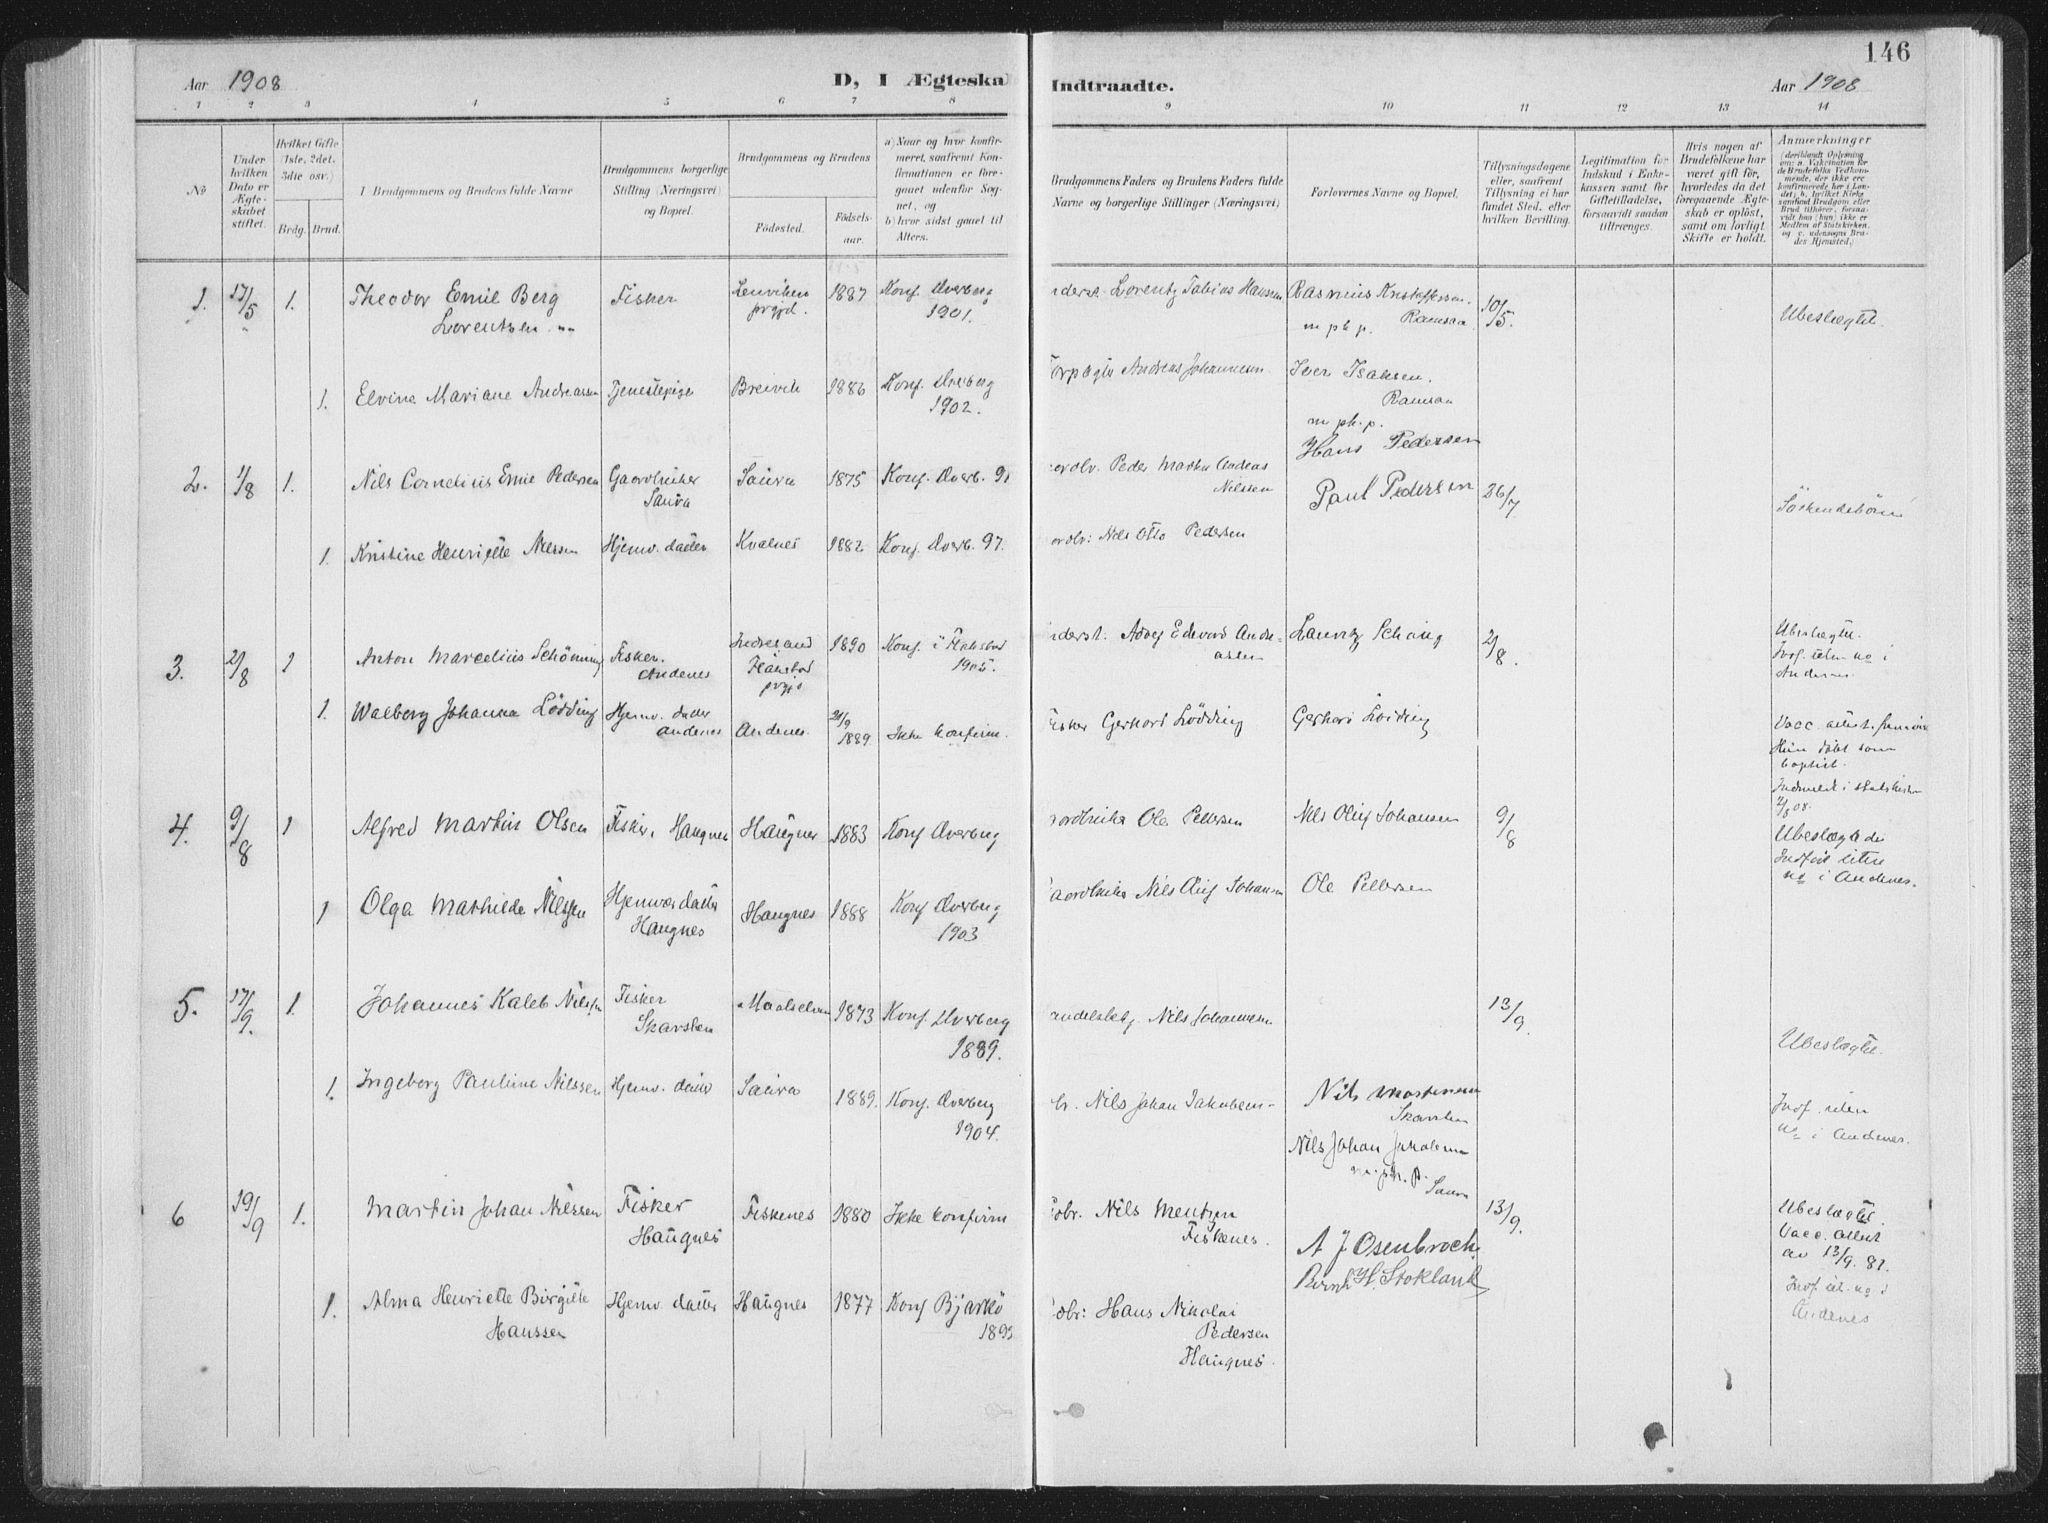 SAT, Ministerialprotokoller, klokkerbøker og fødselsregistre - Nordland, 897/L1400: Ministerialbok nr. 897A07, 1897-1908, s. 146